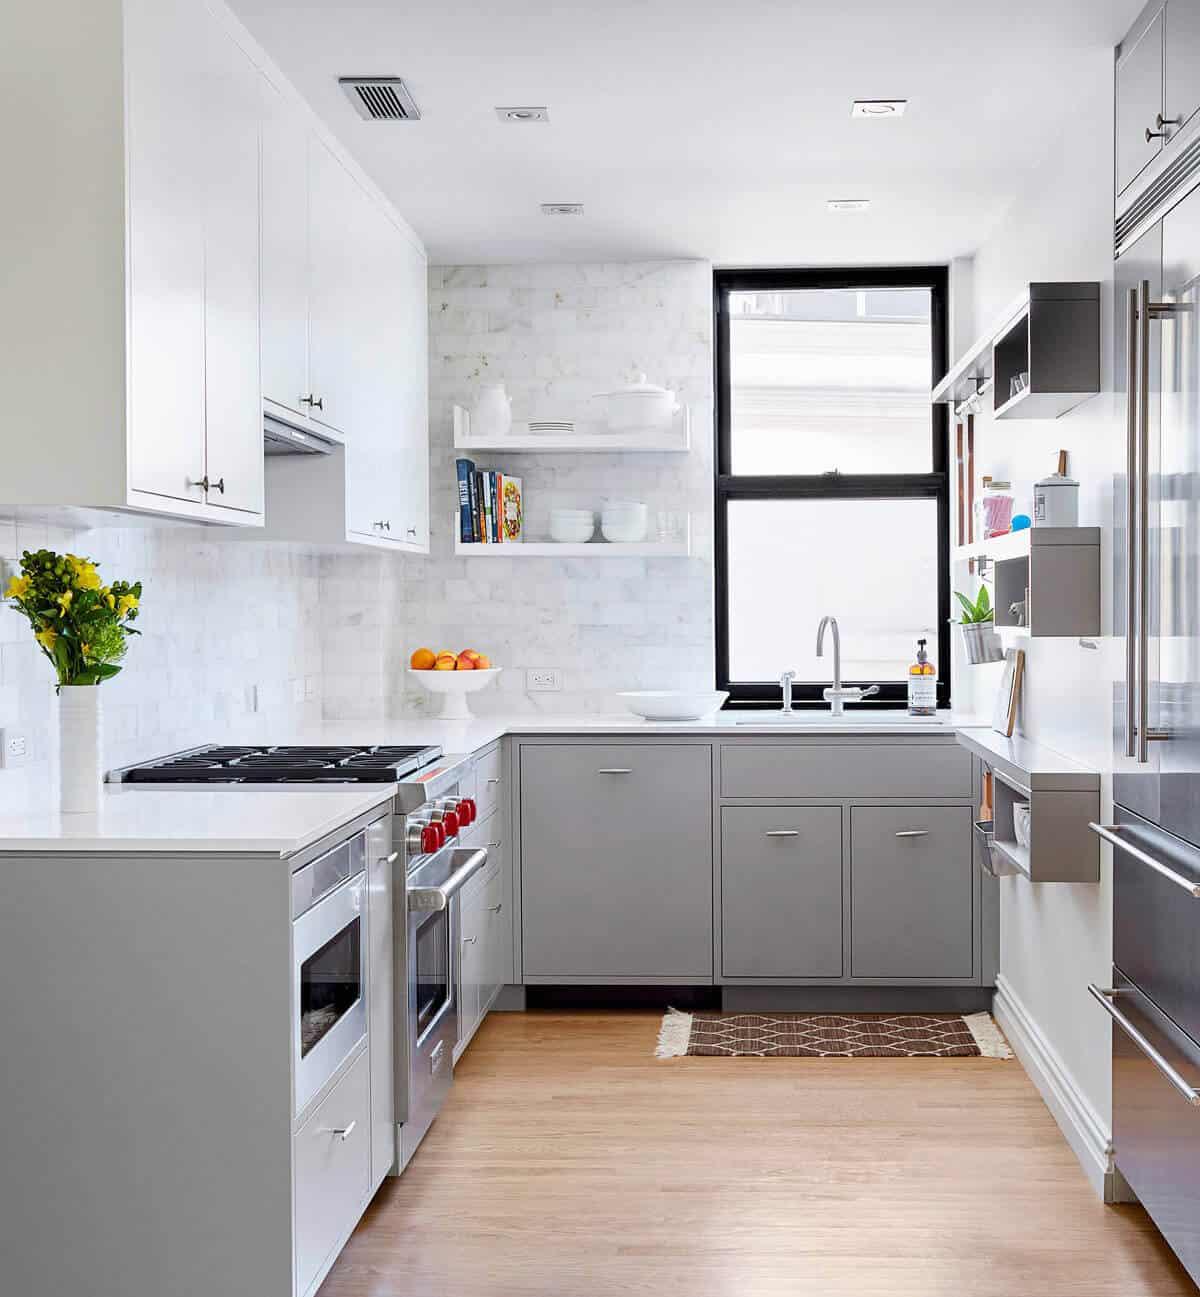 Grey Kitchen Cabinets Ideas 25 Inspiring Design Pictures